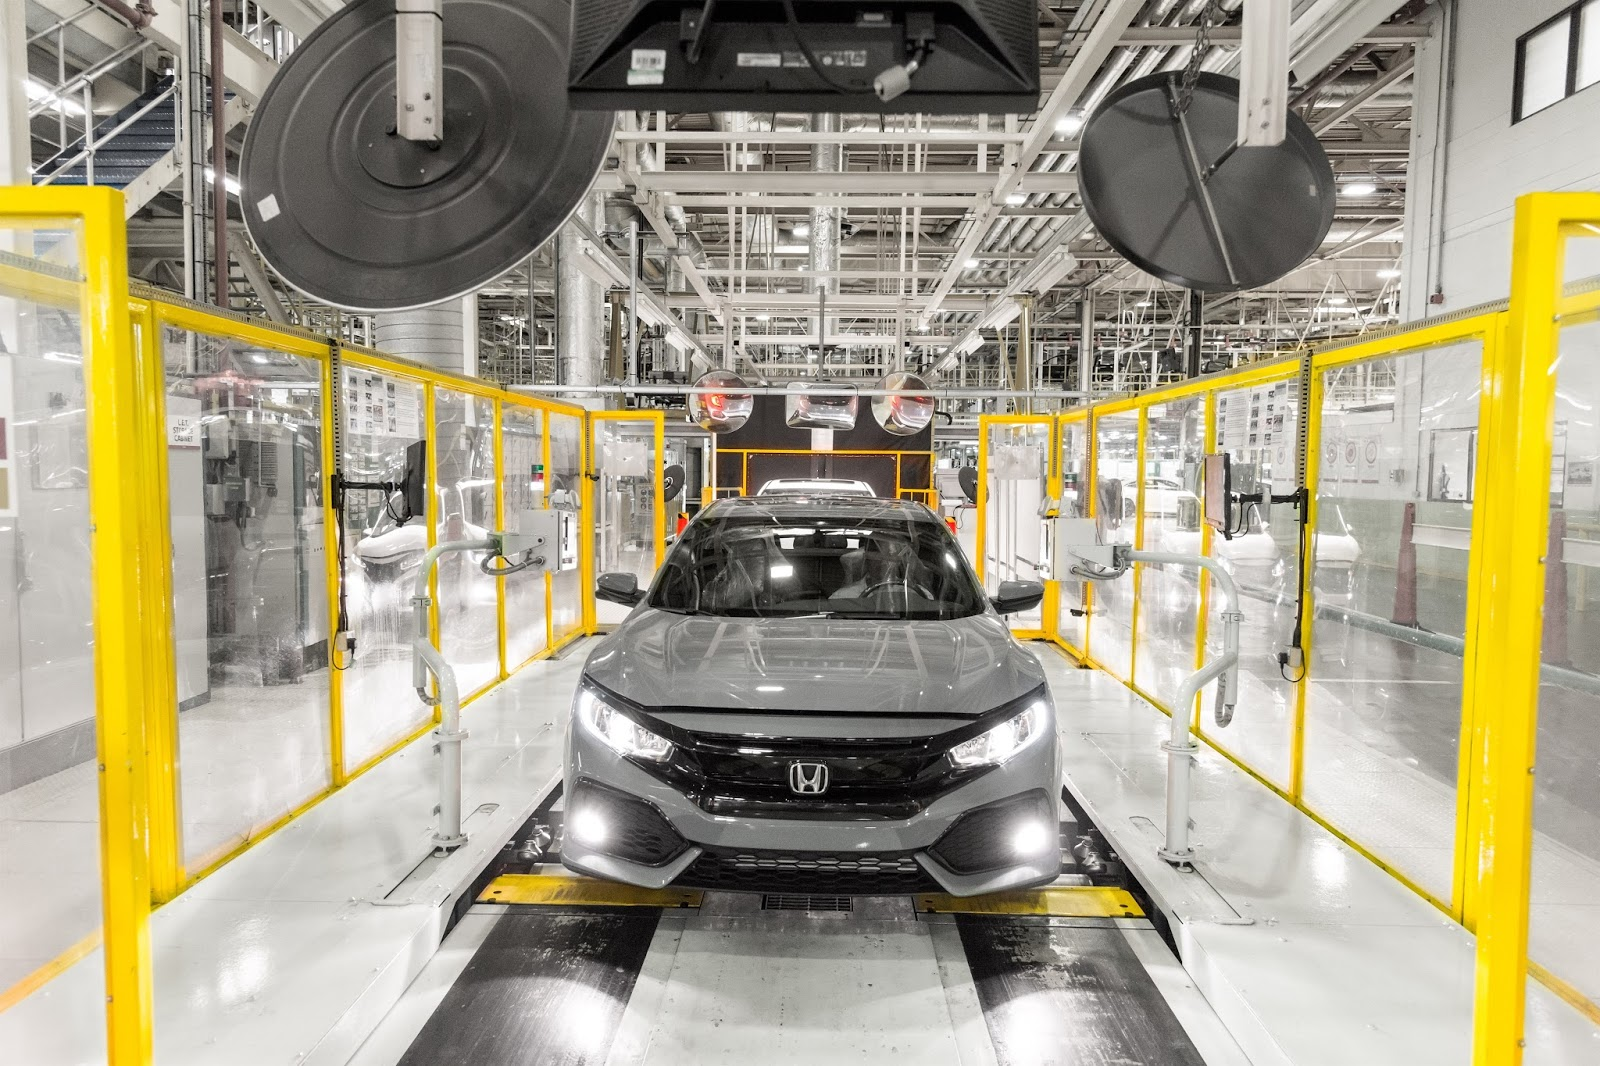 78279 Honda of the UK Manufacturing Τα Honda δεν χαλάνε ποτέ, λέει έρευνα